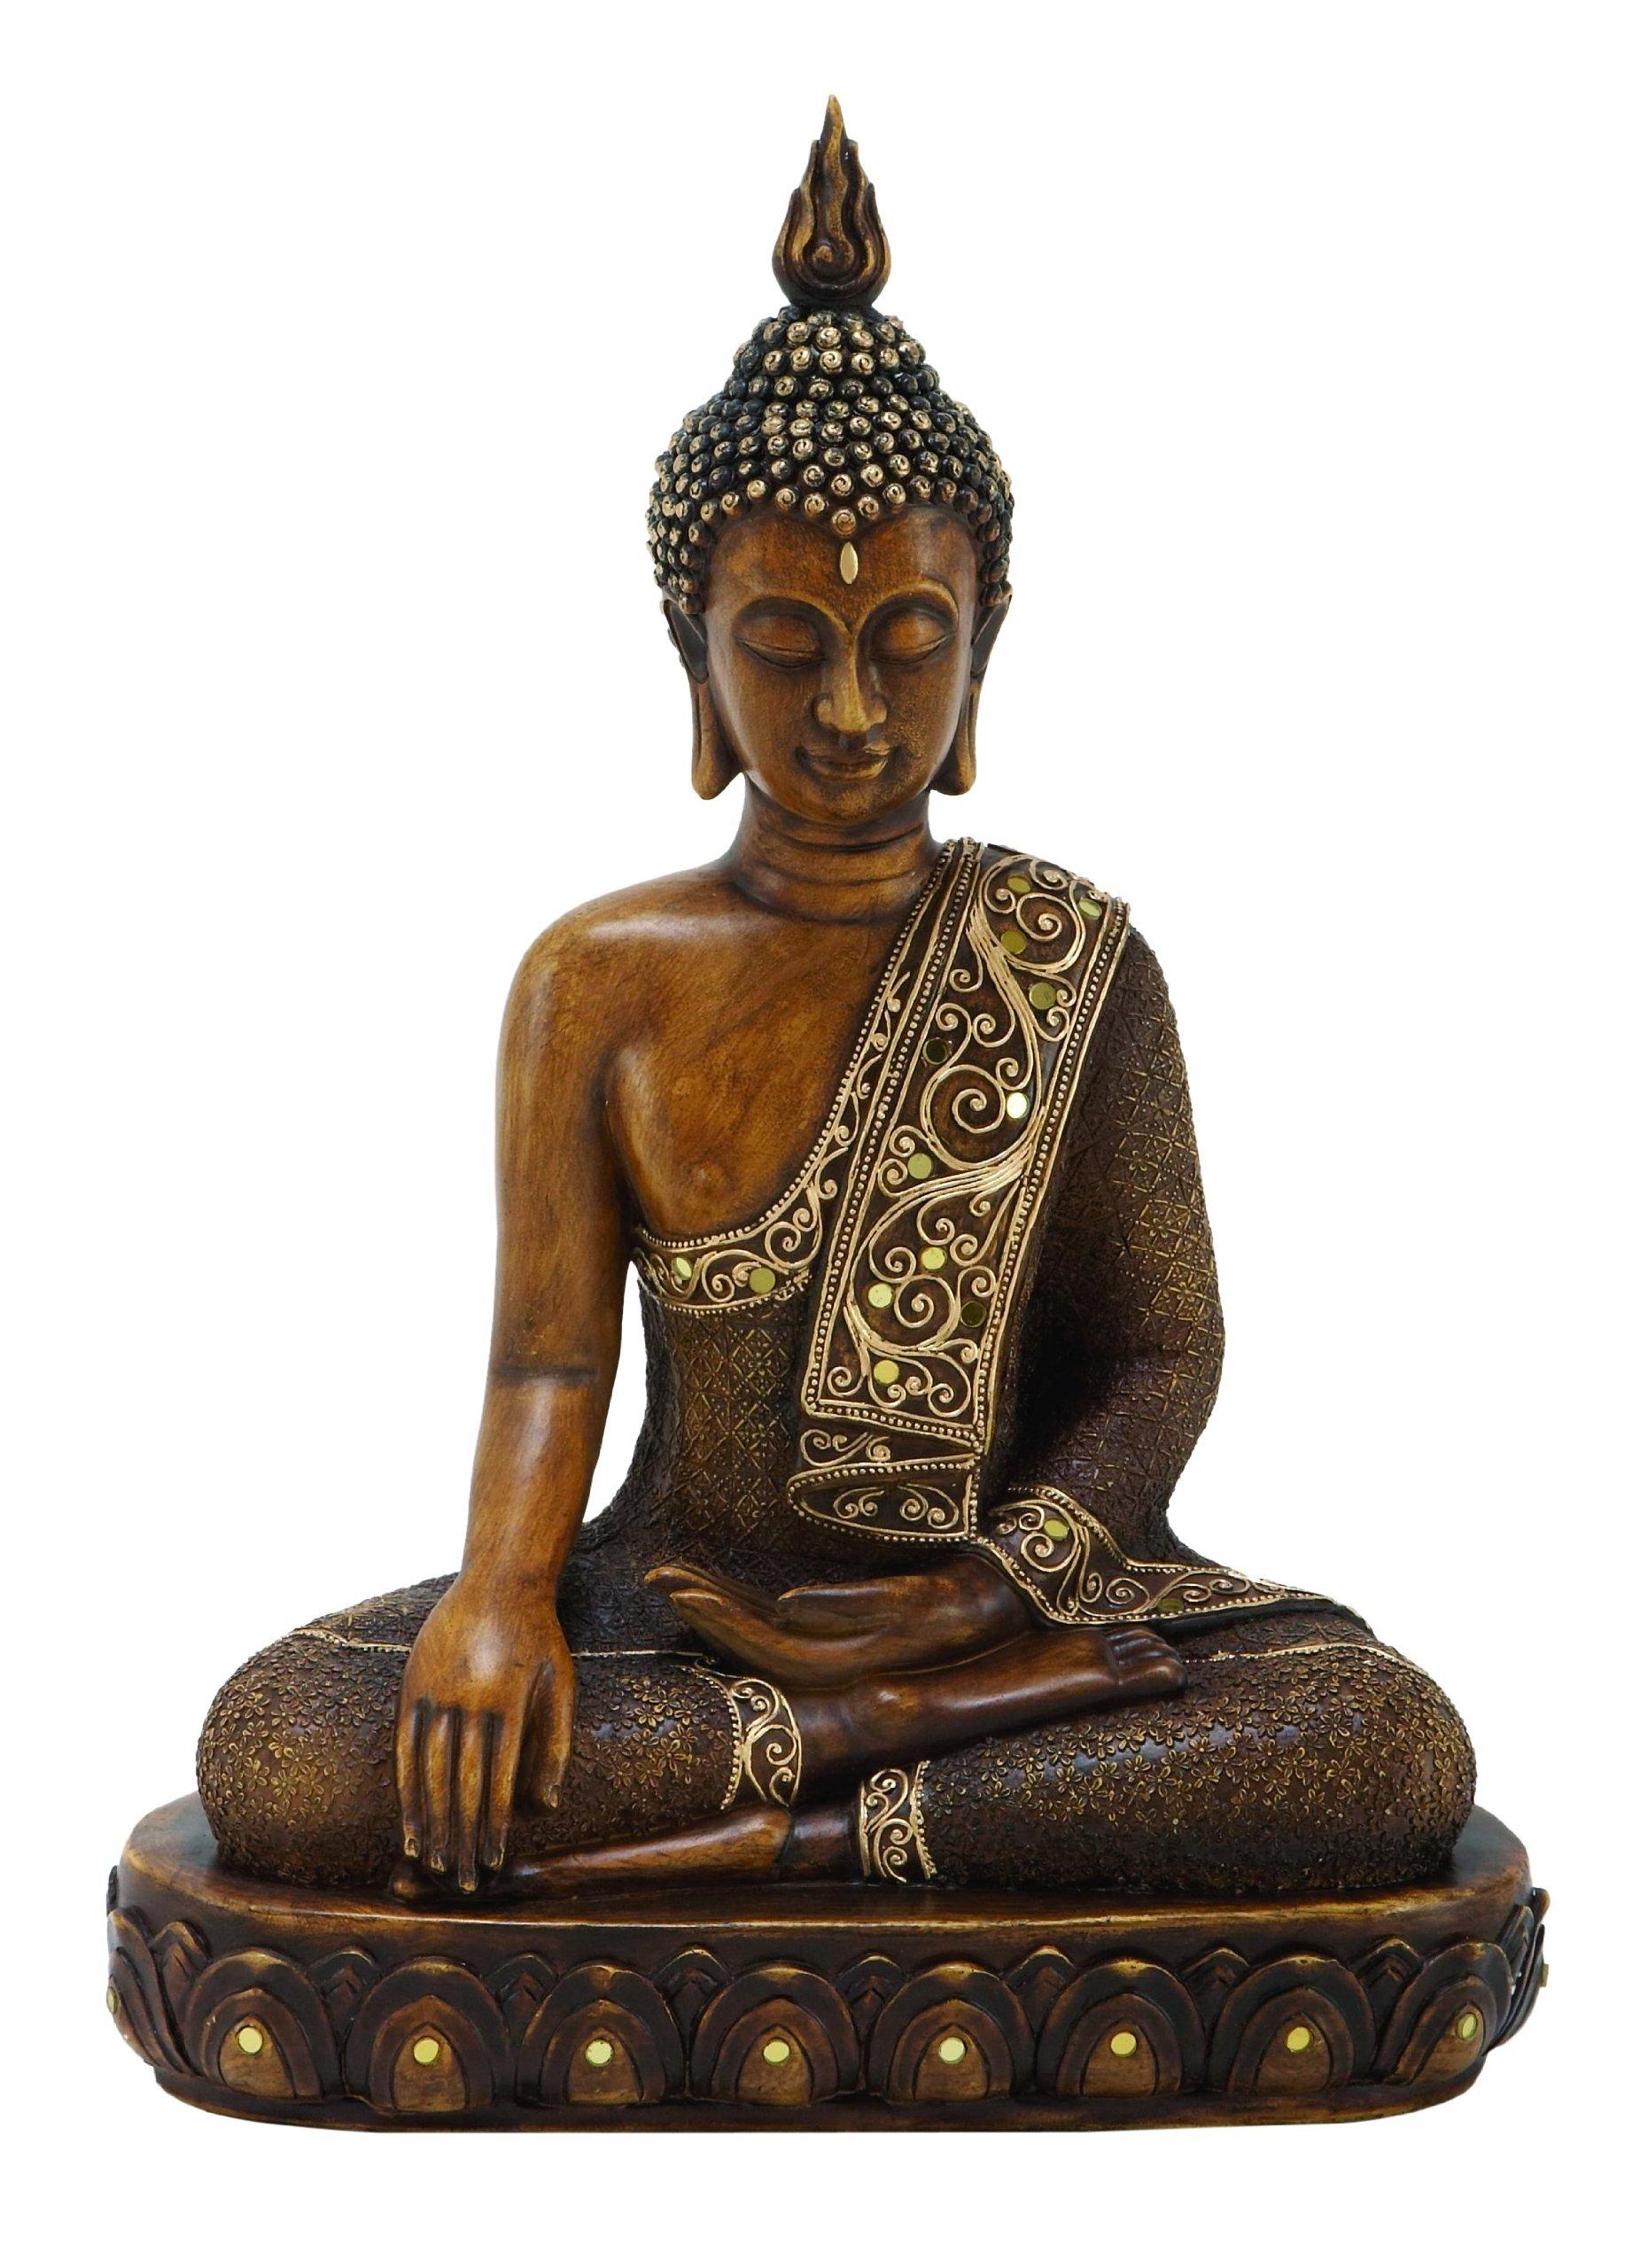 Benzara Asian-Themed Sitting Polystone Buddha Sculpture, 15 by 12'', Textured Bronze Finish by Benzara